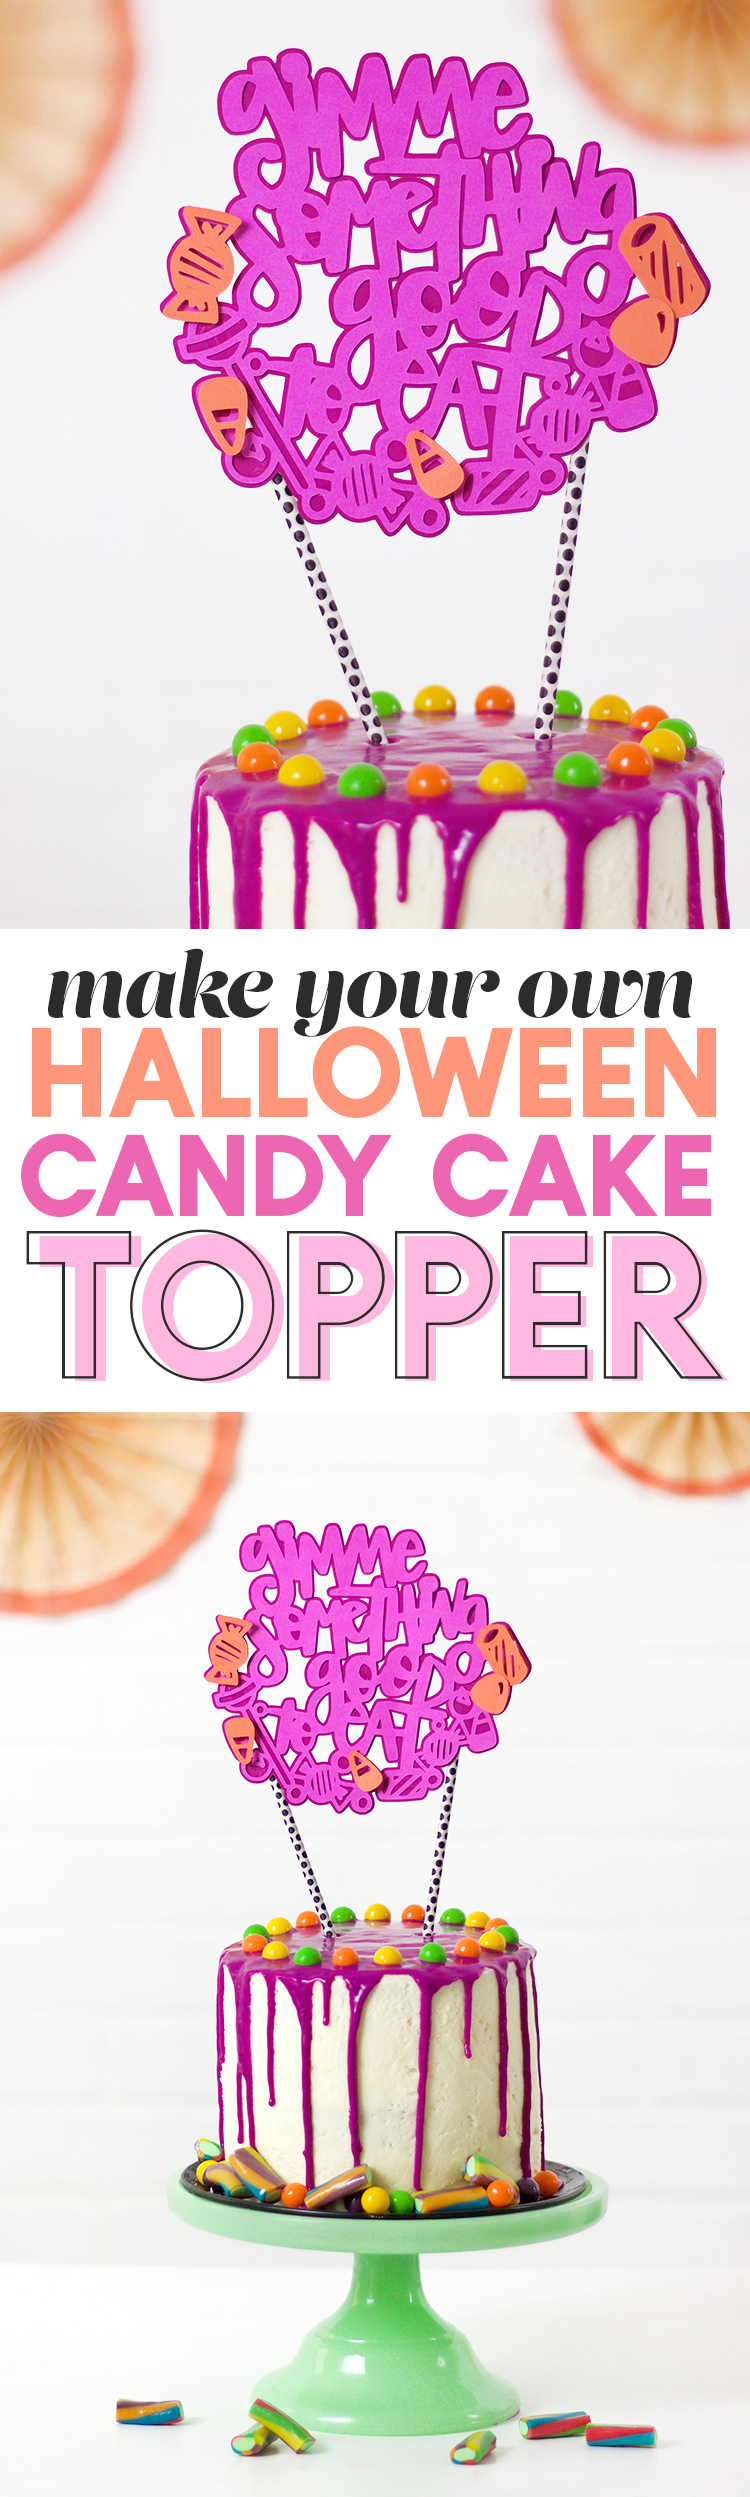 DIY halloween cake topper - Halloween candy cake SVG cut file